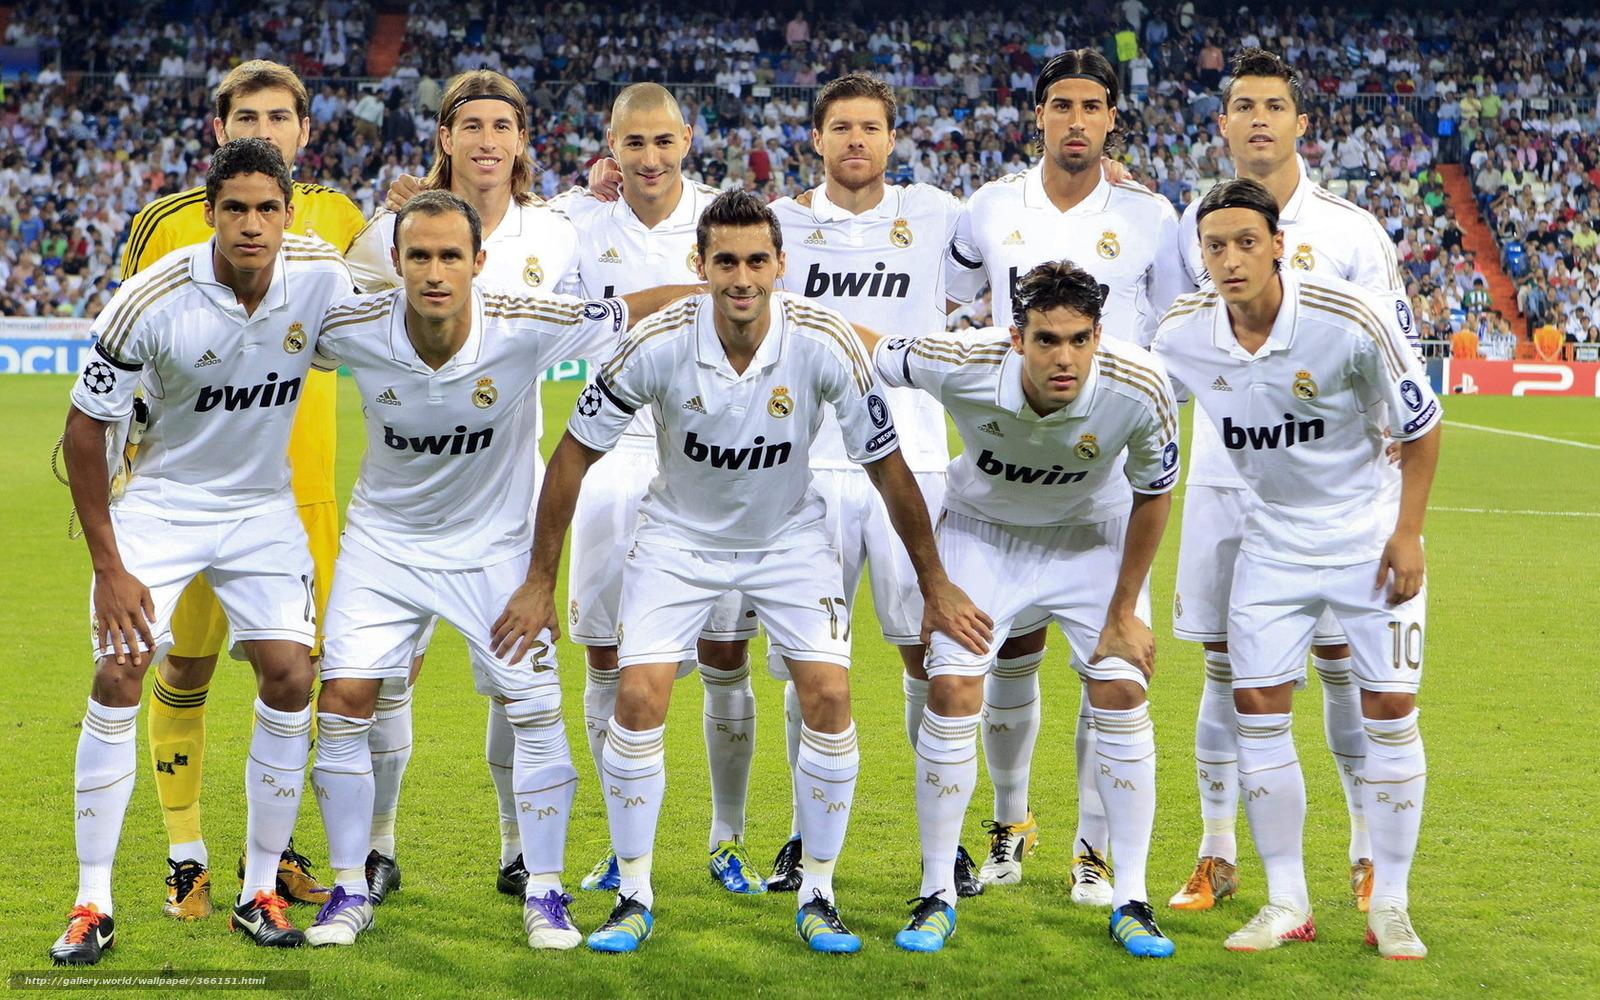 equipe, Real Madrid